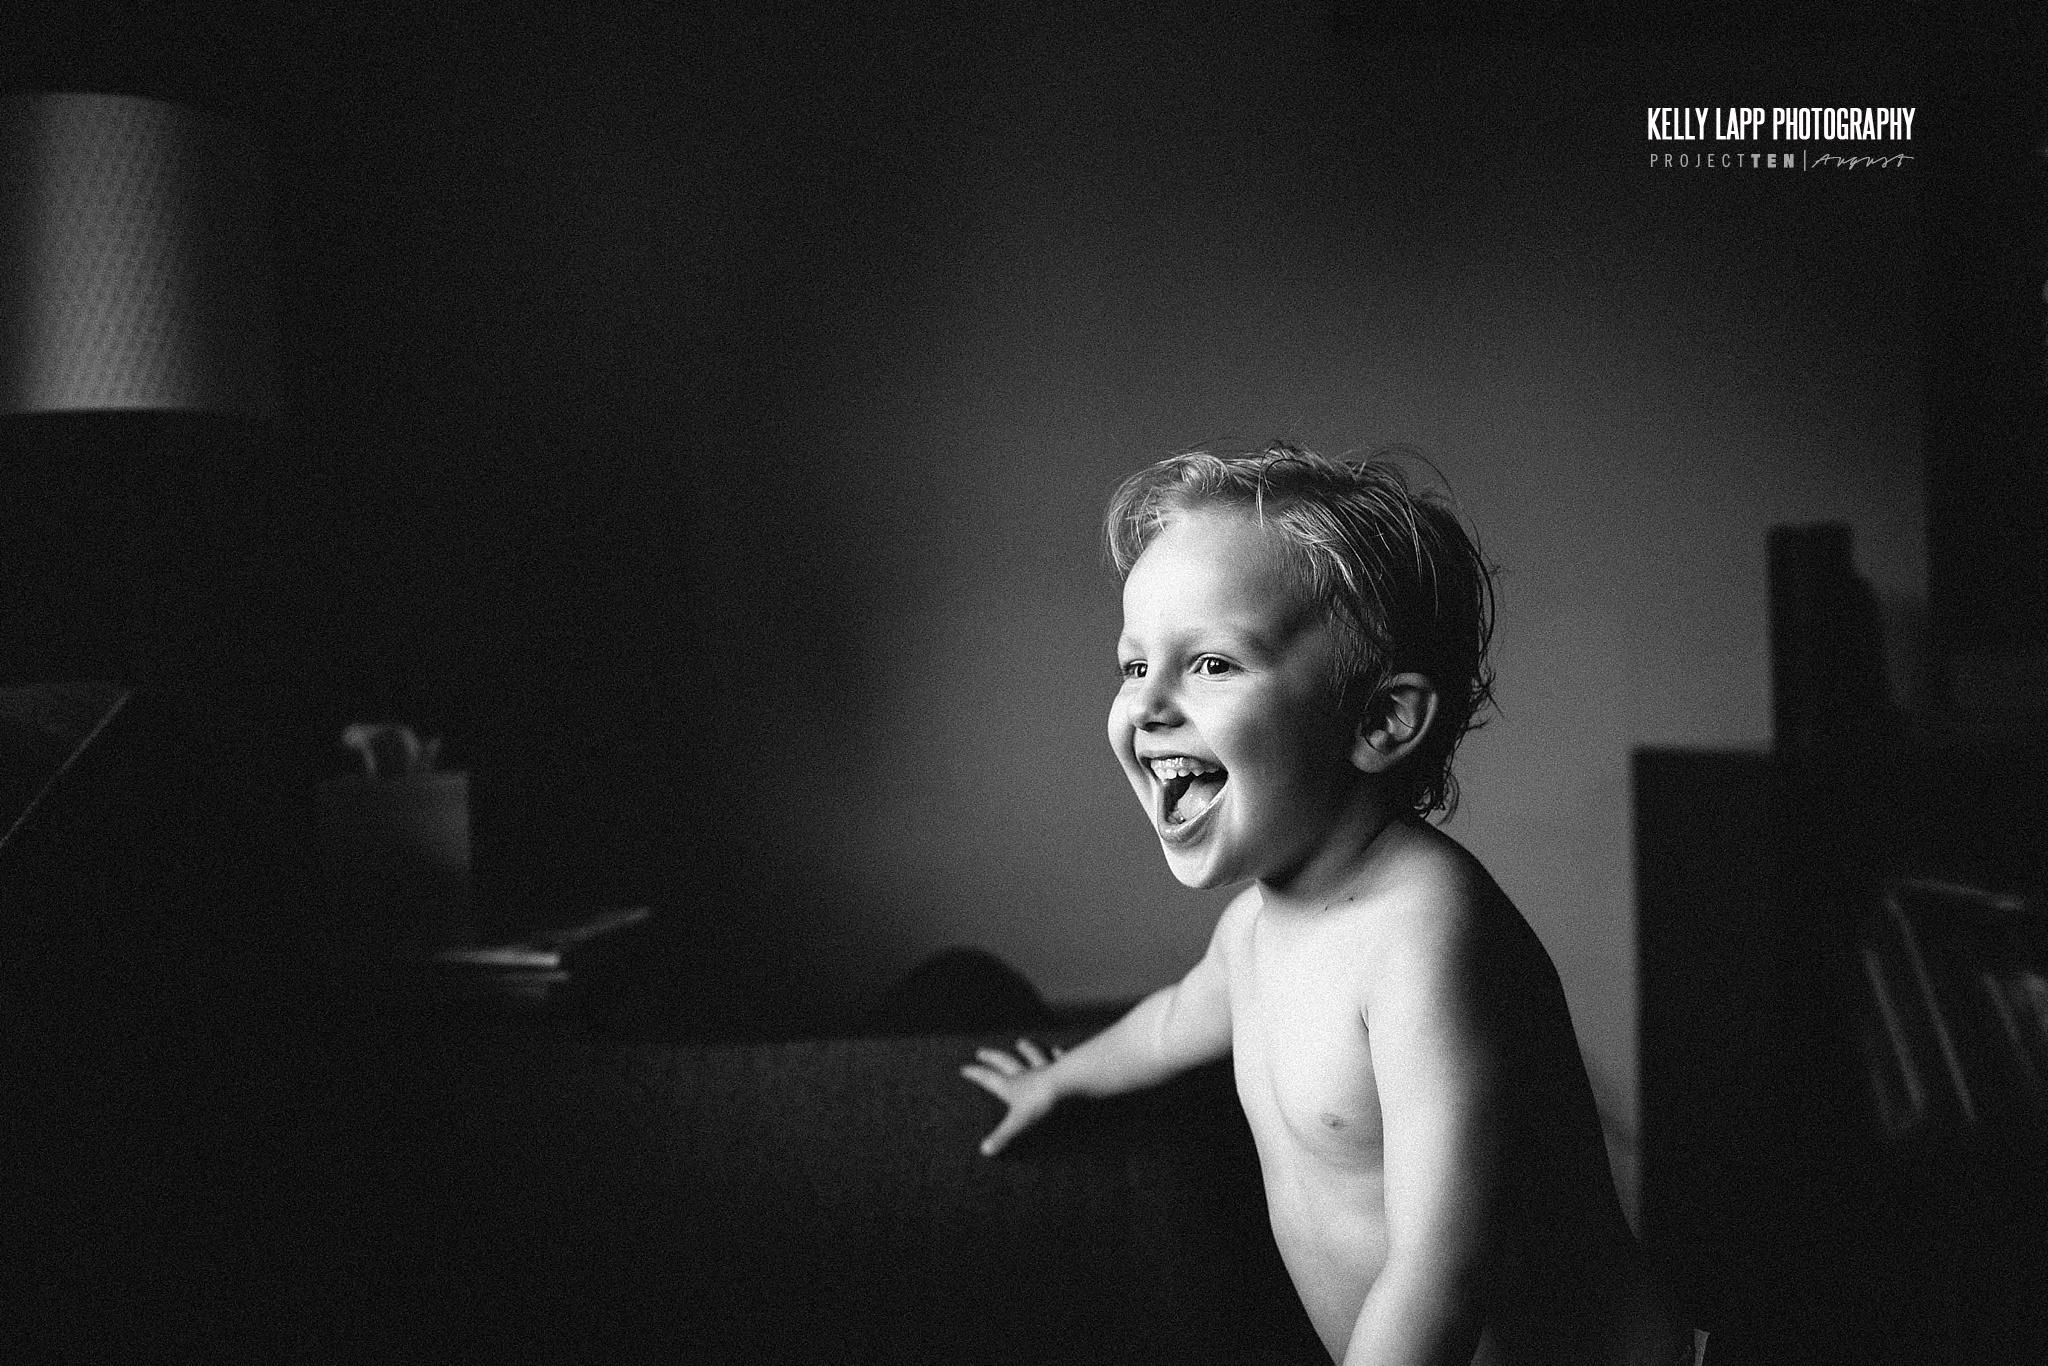 KellyLappPhotography_familyphotojournalism_projectten_august2017_13.JPG